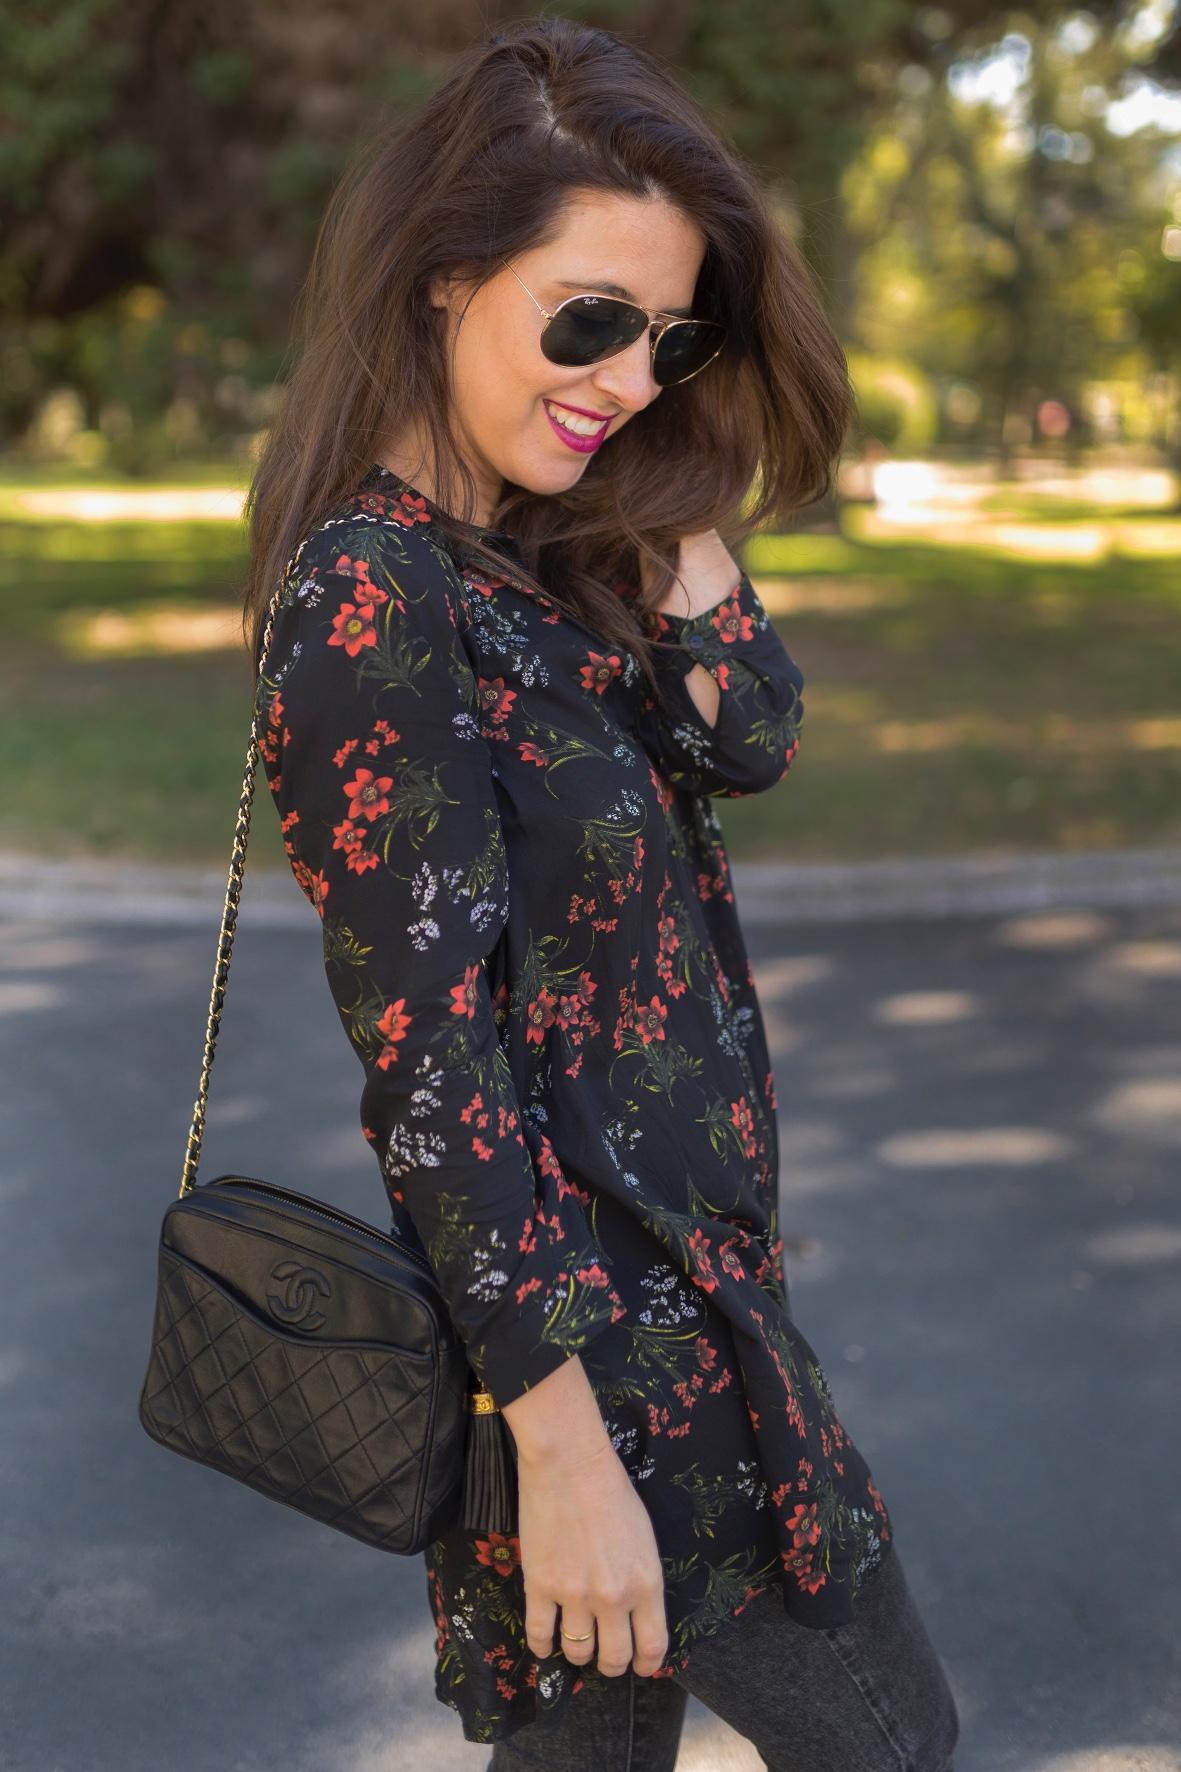 chanel bag ,babuchas, marruecos, look, zara, fashion, outfit, street style, blogger, alba cuesta, estilista